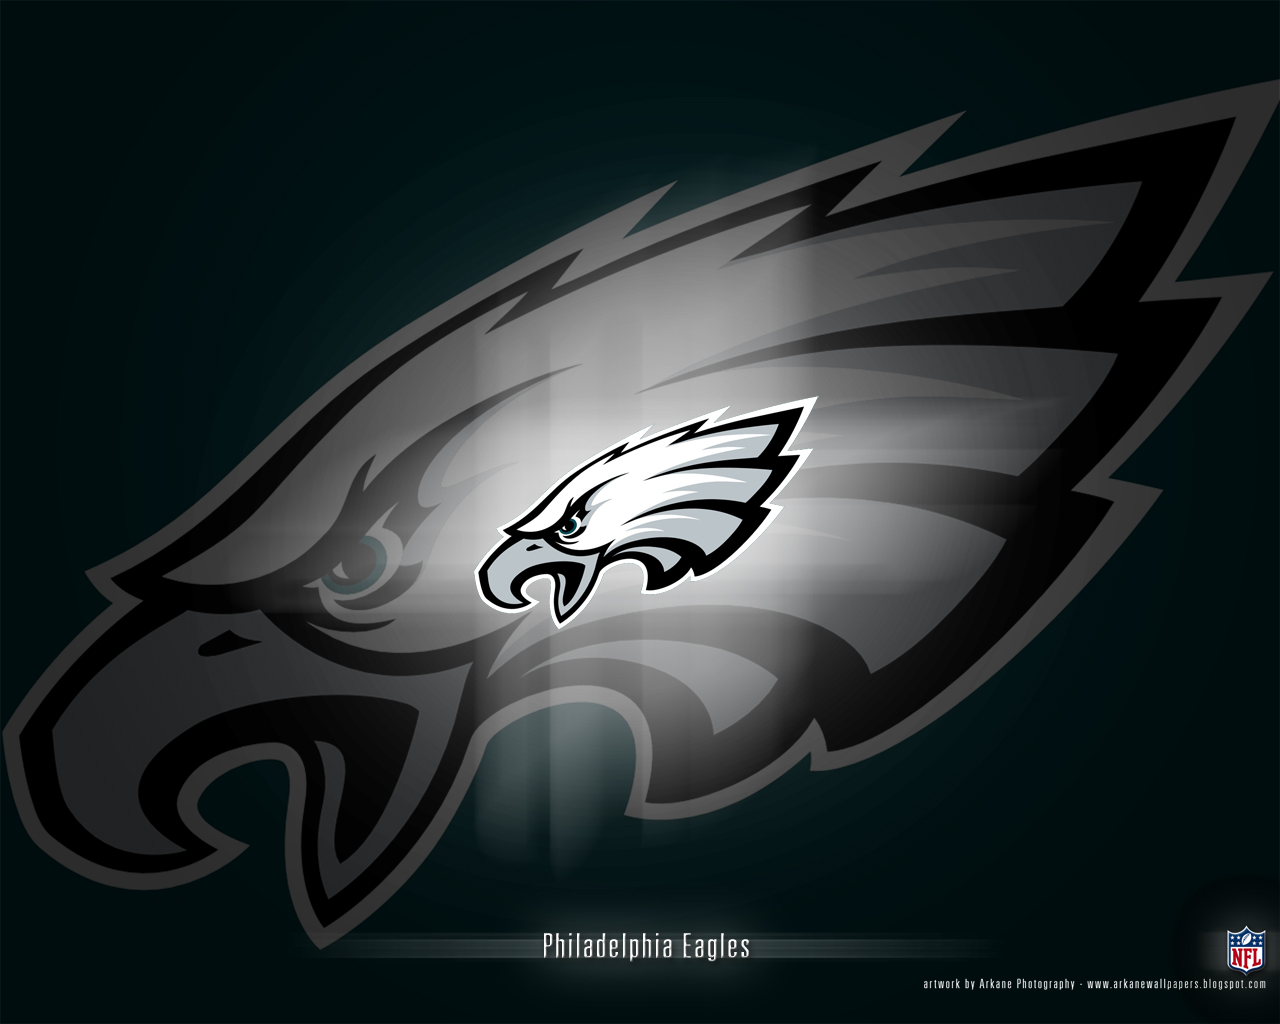 Philadelphia Eagles Wallpaper Nfl | HD